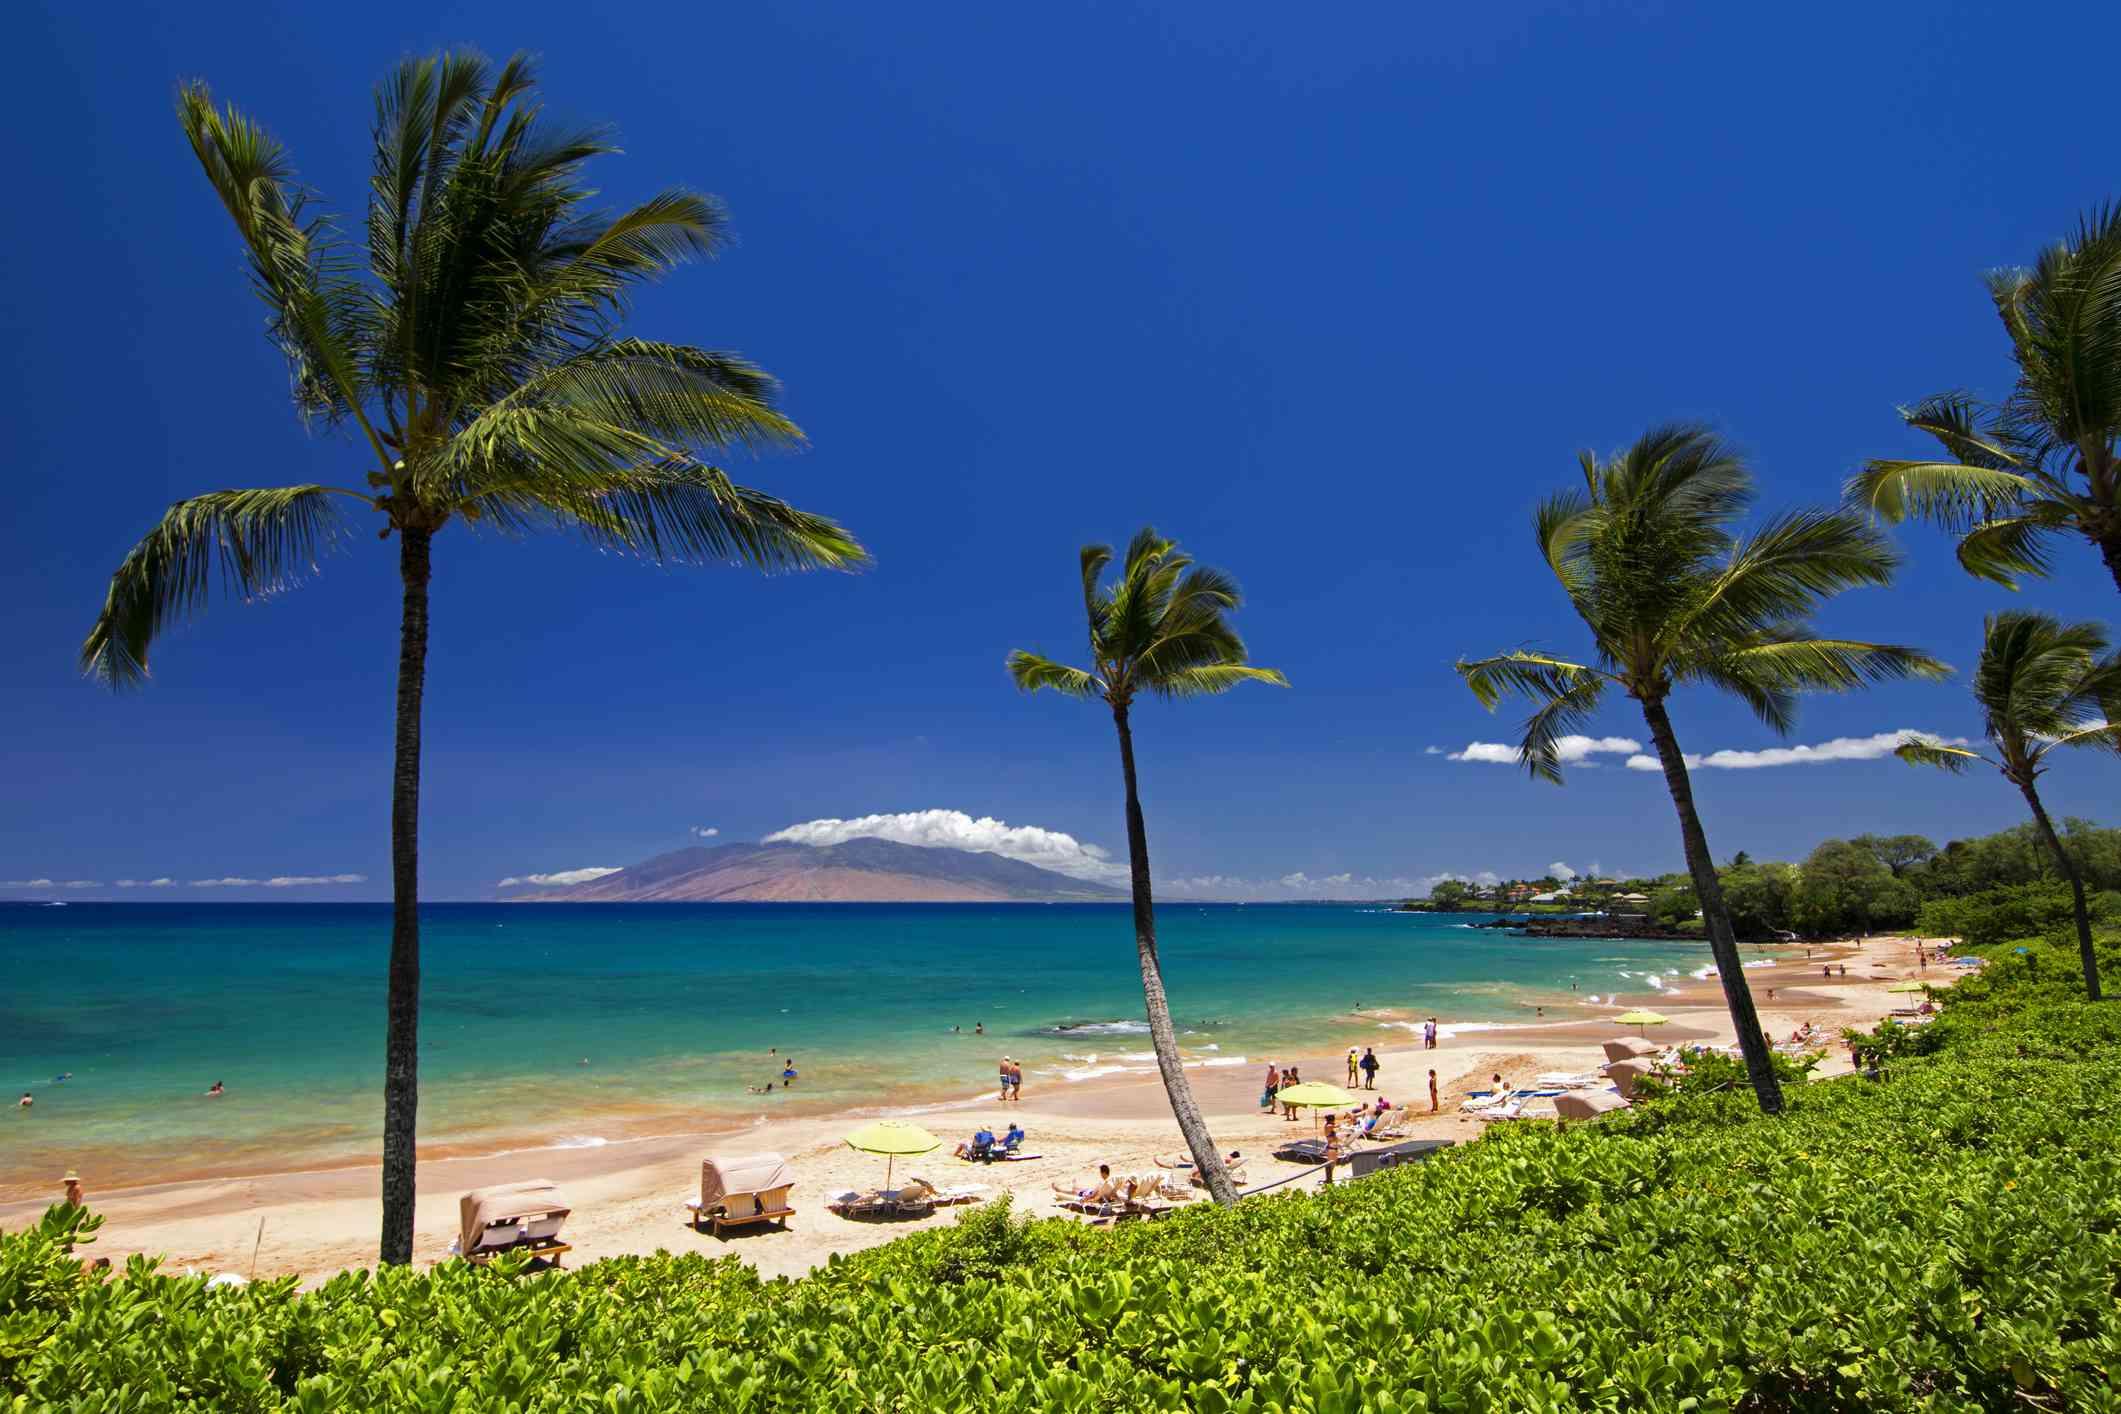 Maluaka Beach (AKA Turtle Town) on Maui